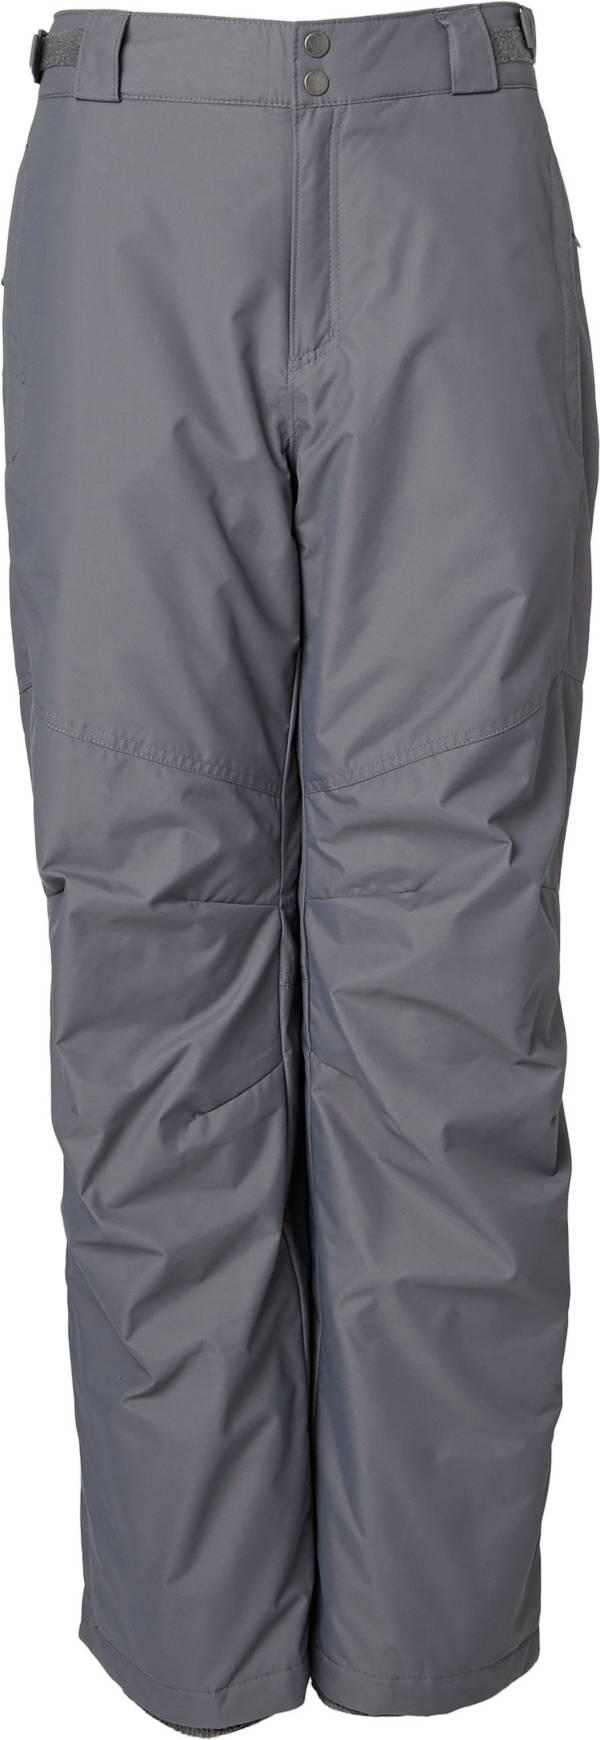 Columbia Men's Bugaboo IV Pants product image